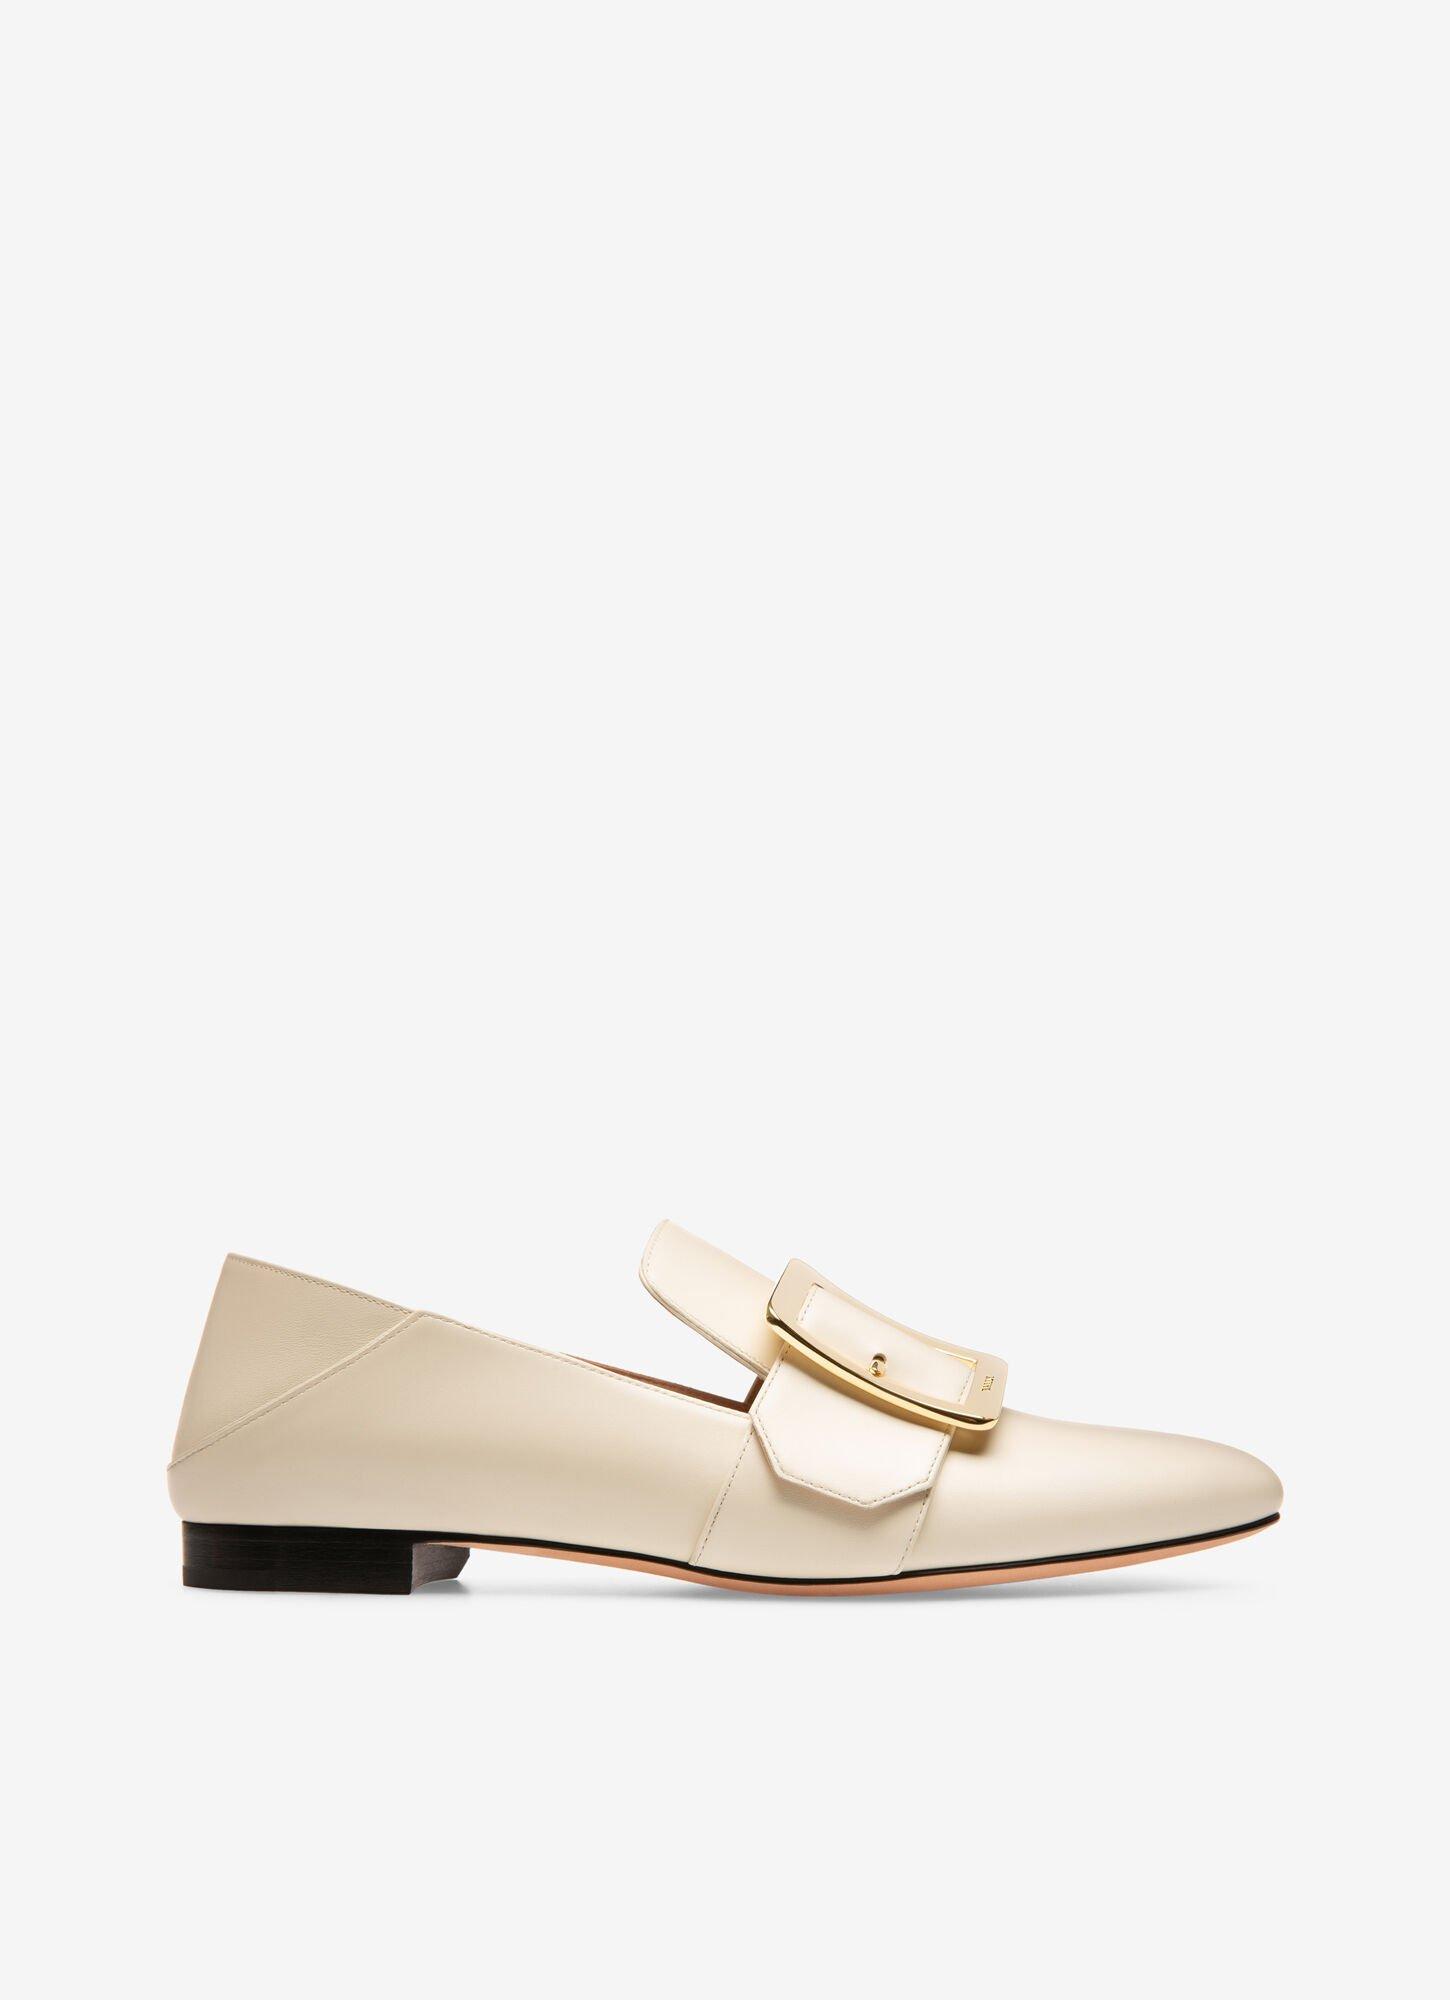 Women's Designer Flat Shoes | Bally